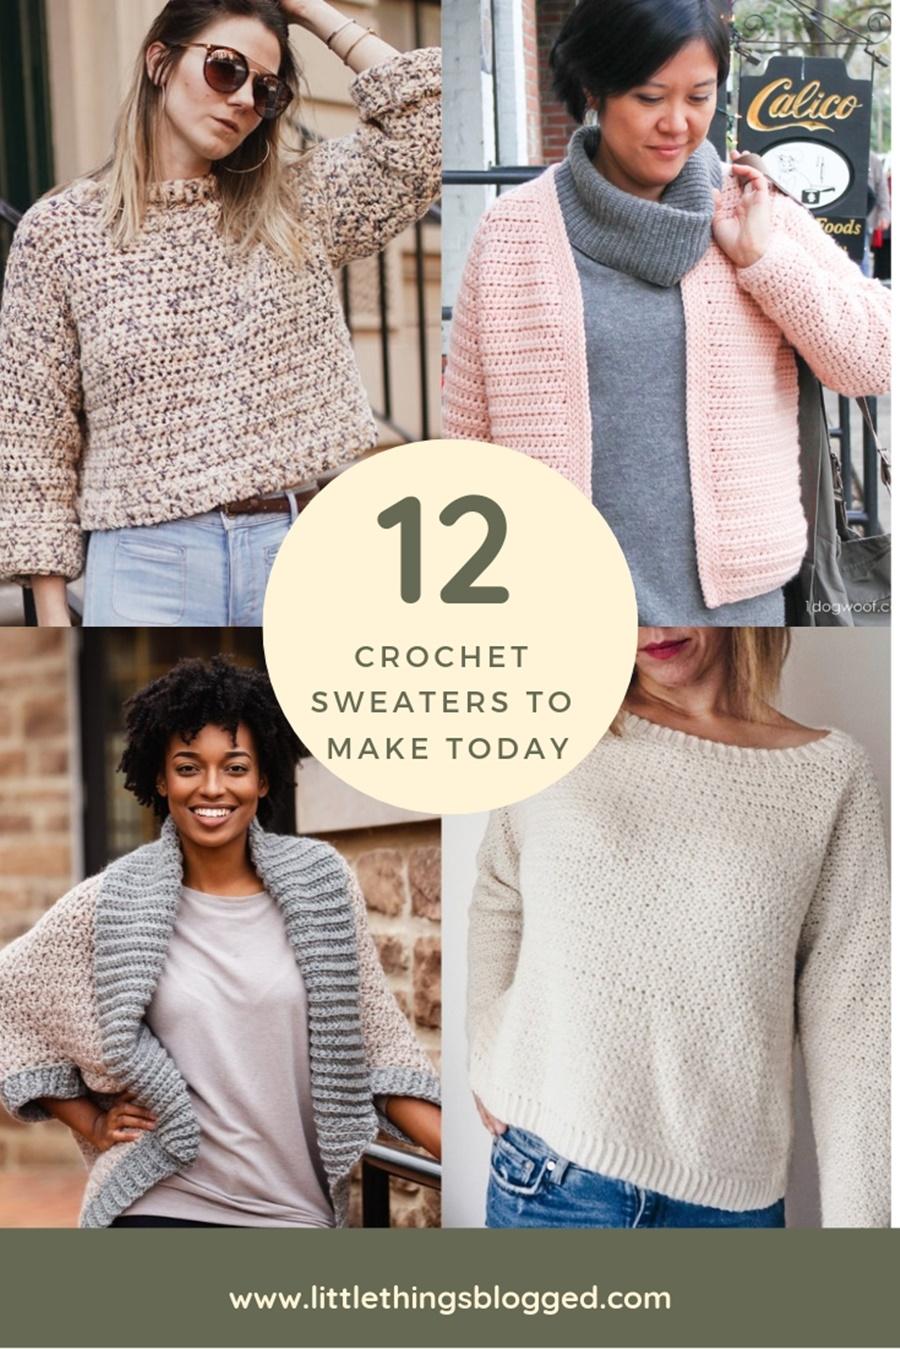 12 crochet sweaters to make today.jpg